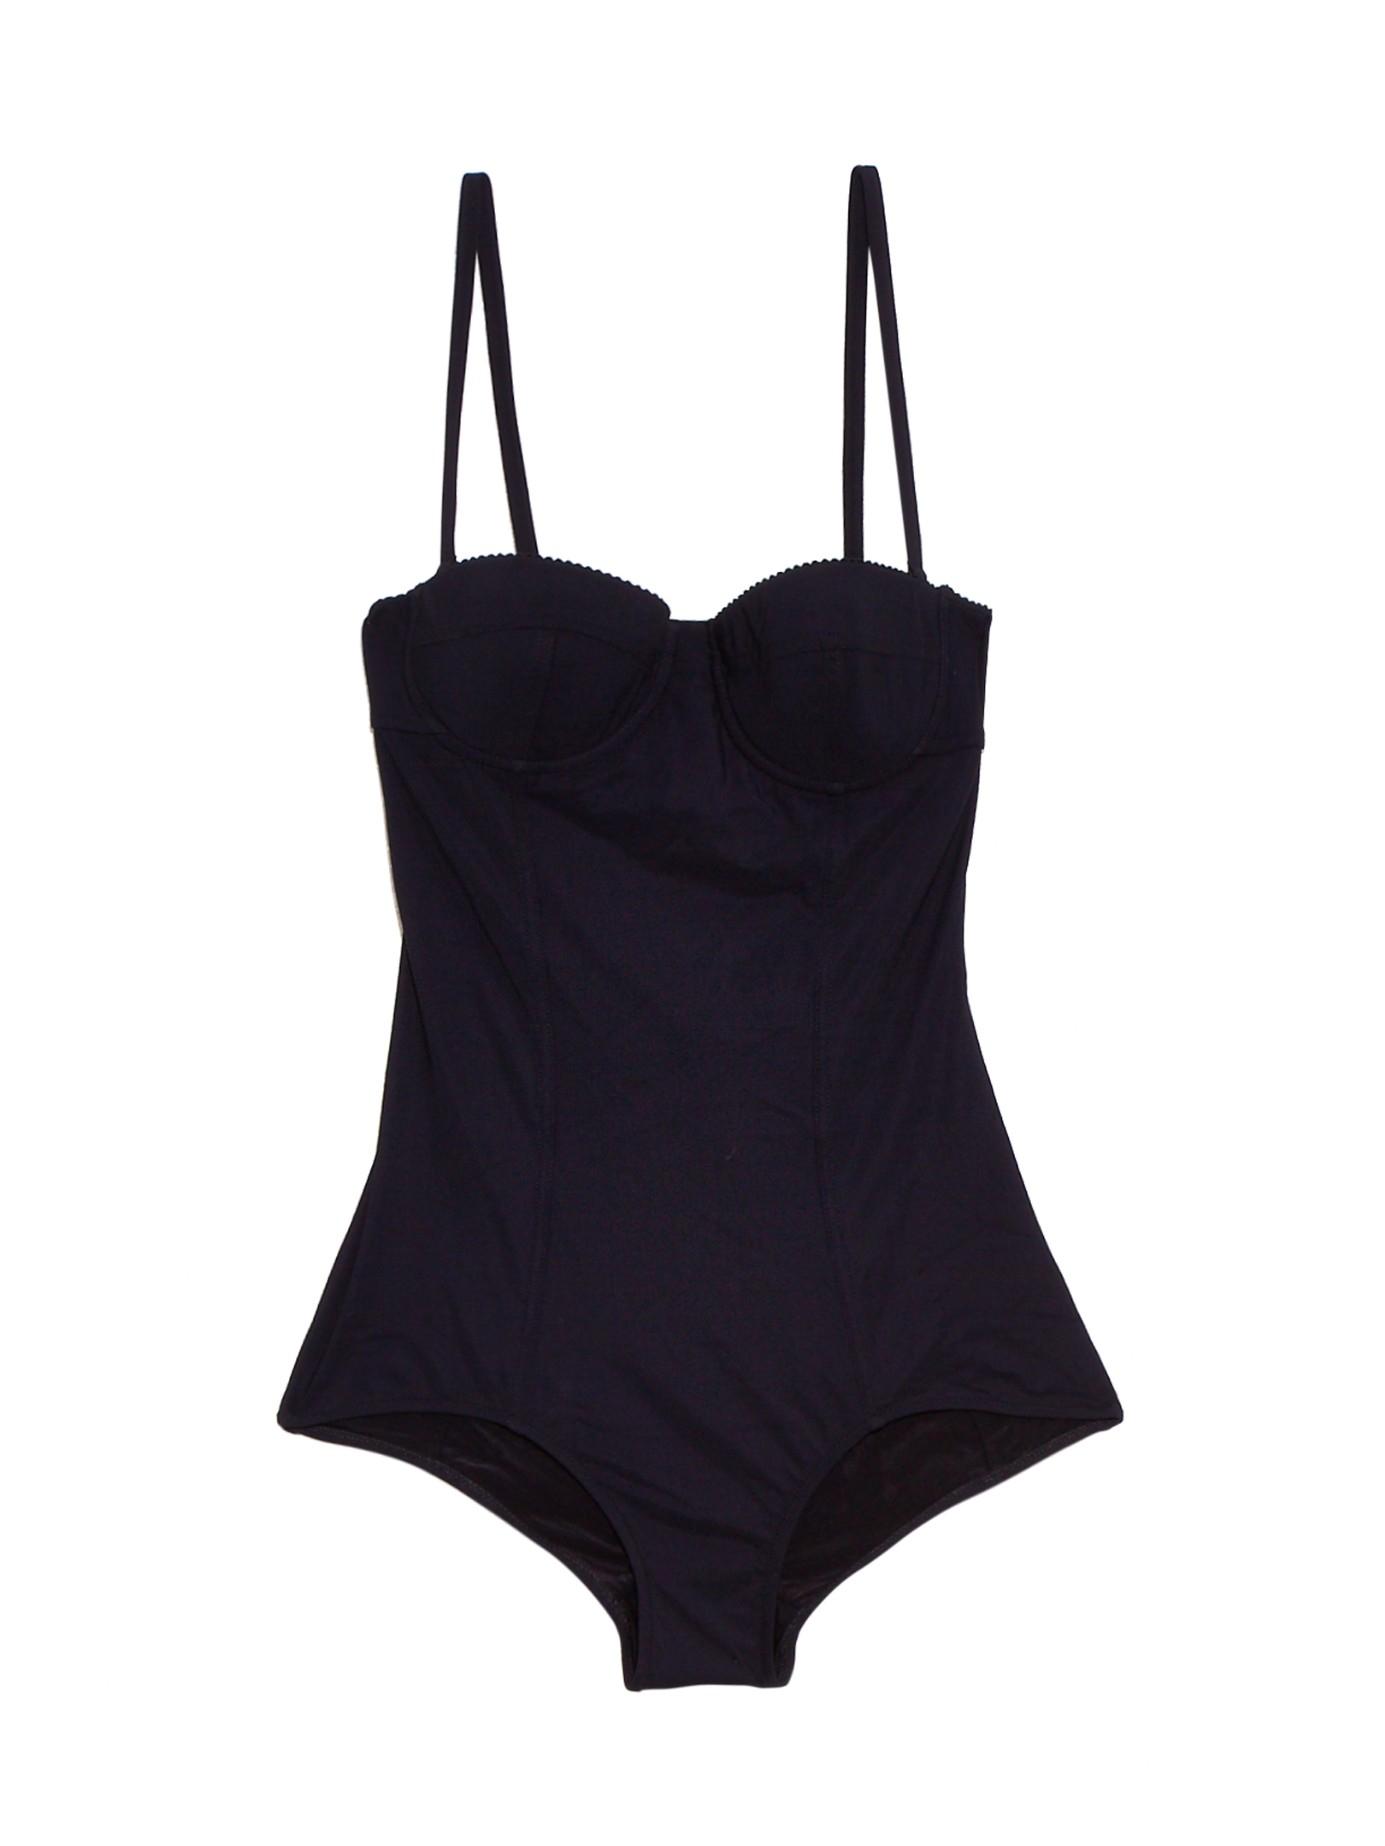 d85595a0e5 Lyst - Dolce   Gabbana Balconette Swimsuit in Black